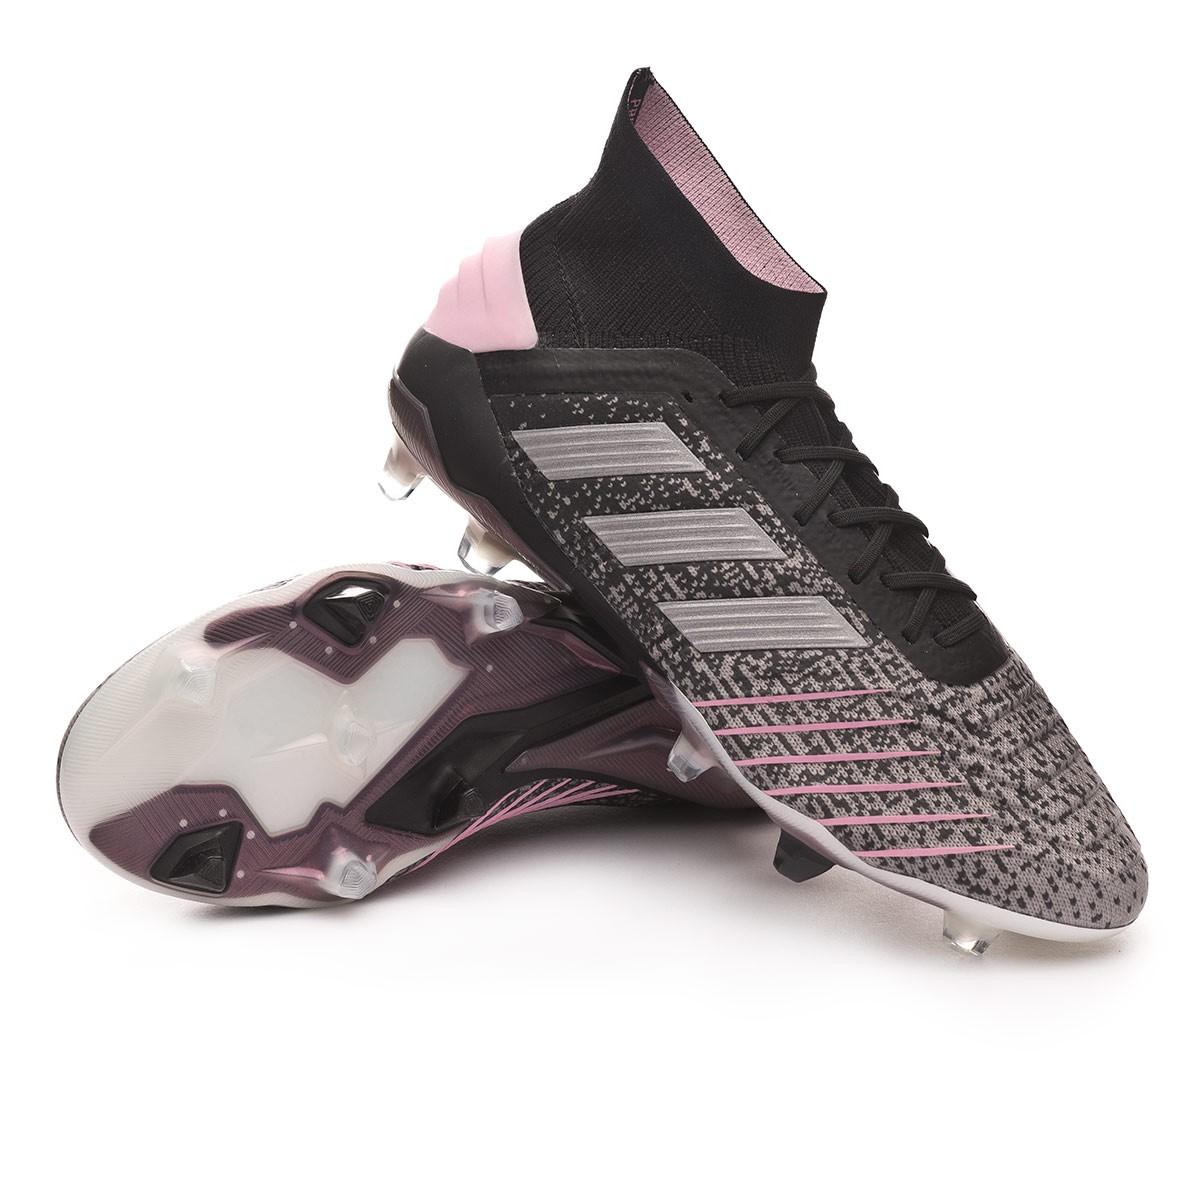 best value 088b1 68494 Football Boots adidas Women Predator 19.1 FG Core black-Silver  metallic-Solid grey - Tienda de fútbol Fútbol Emotion